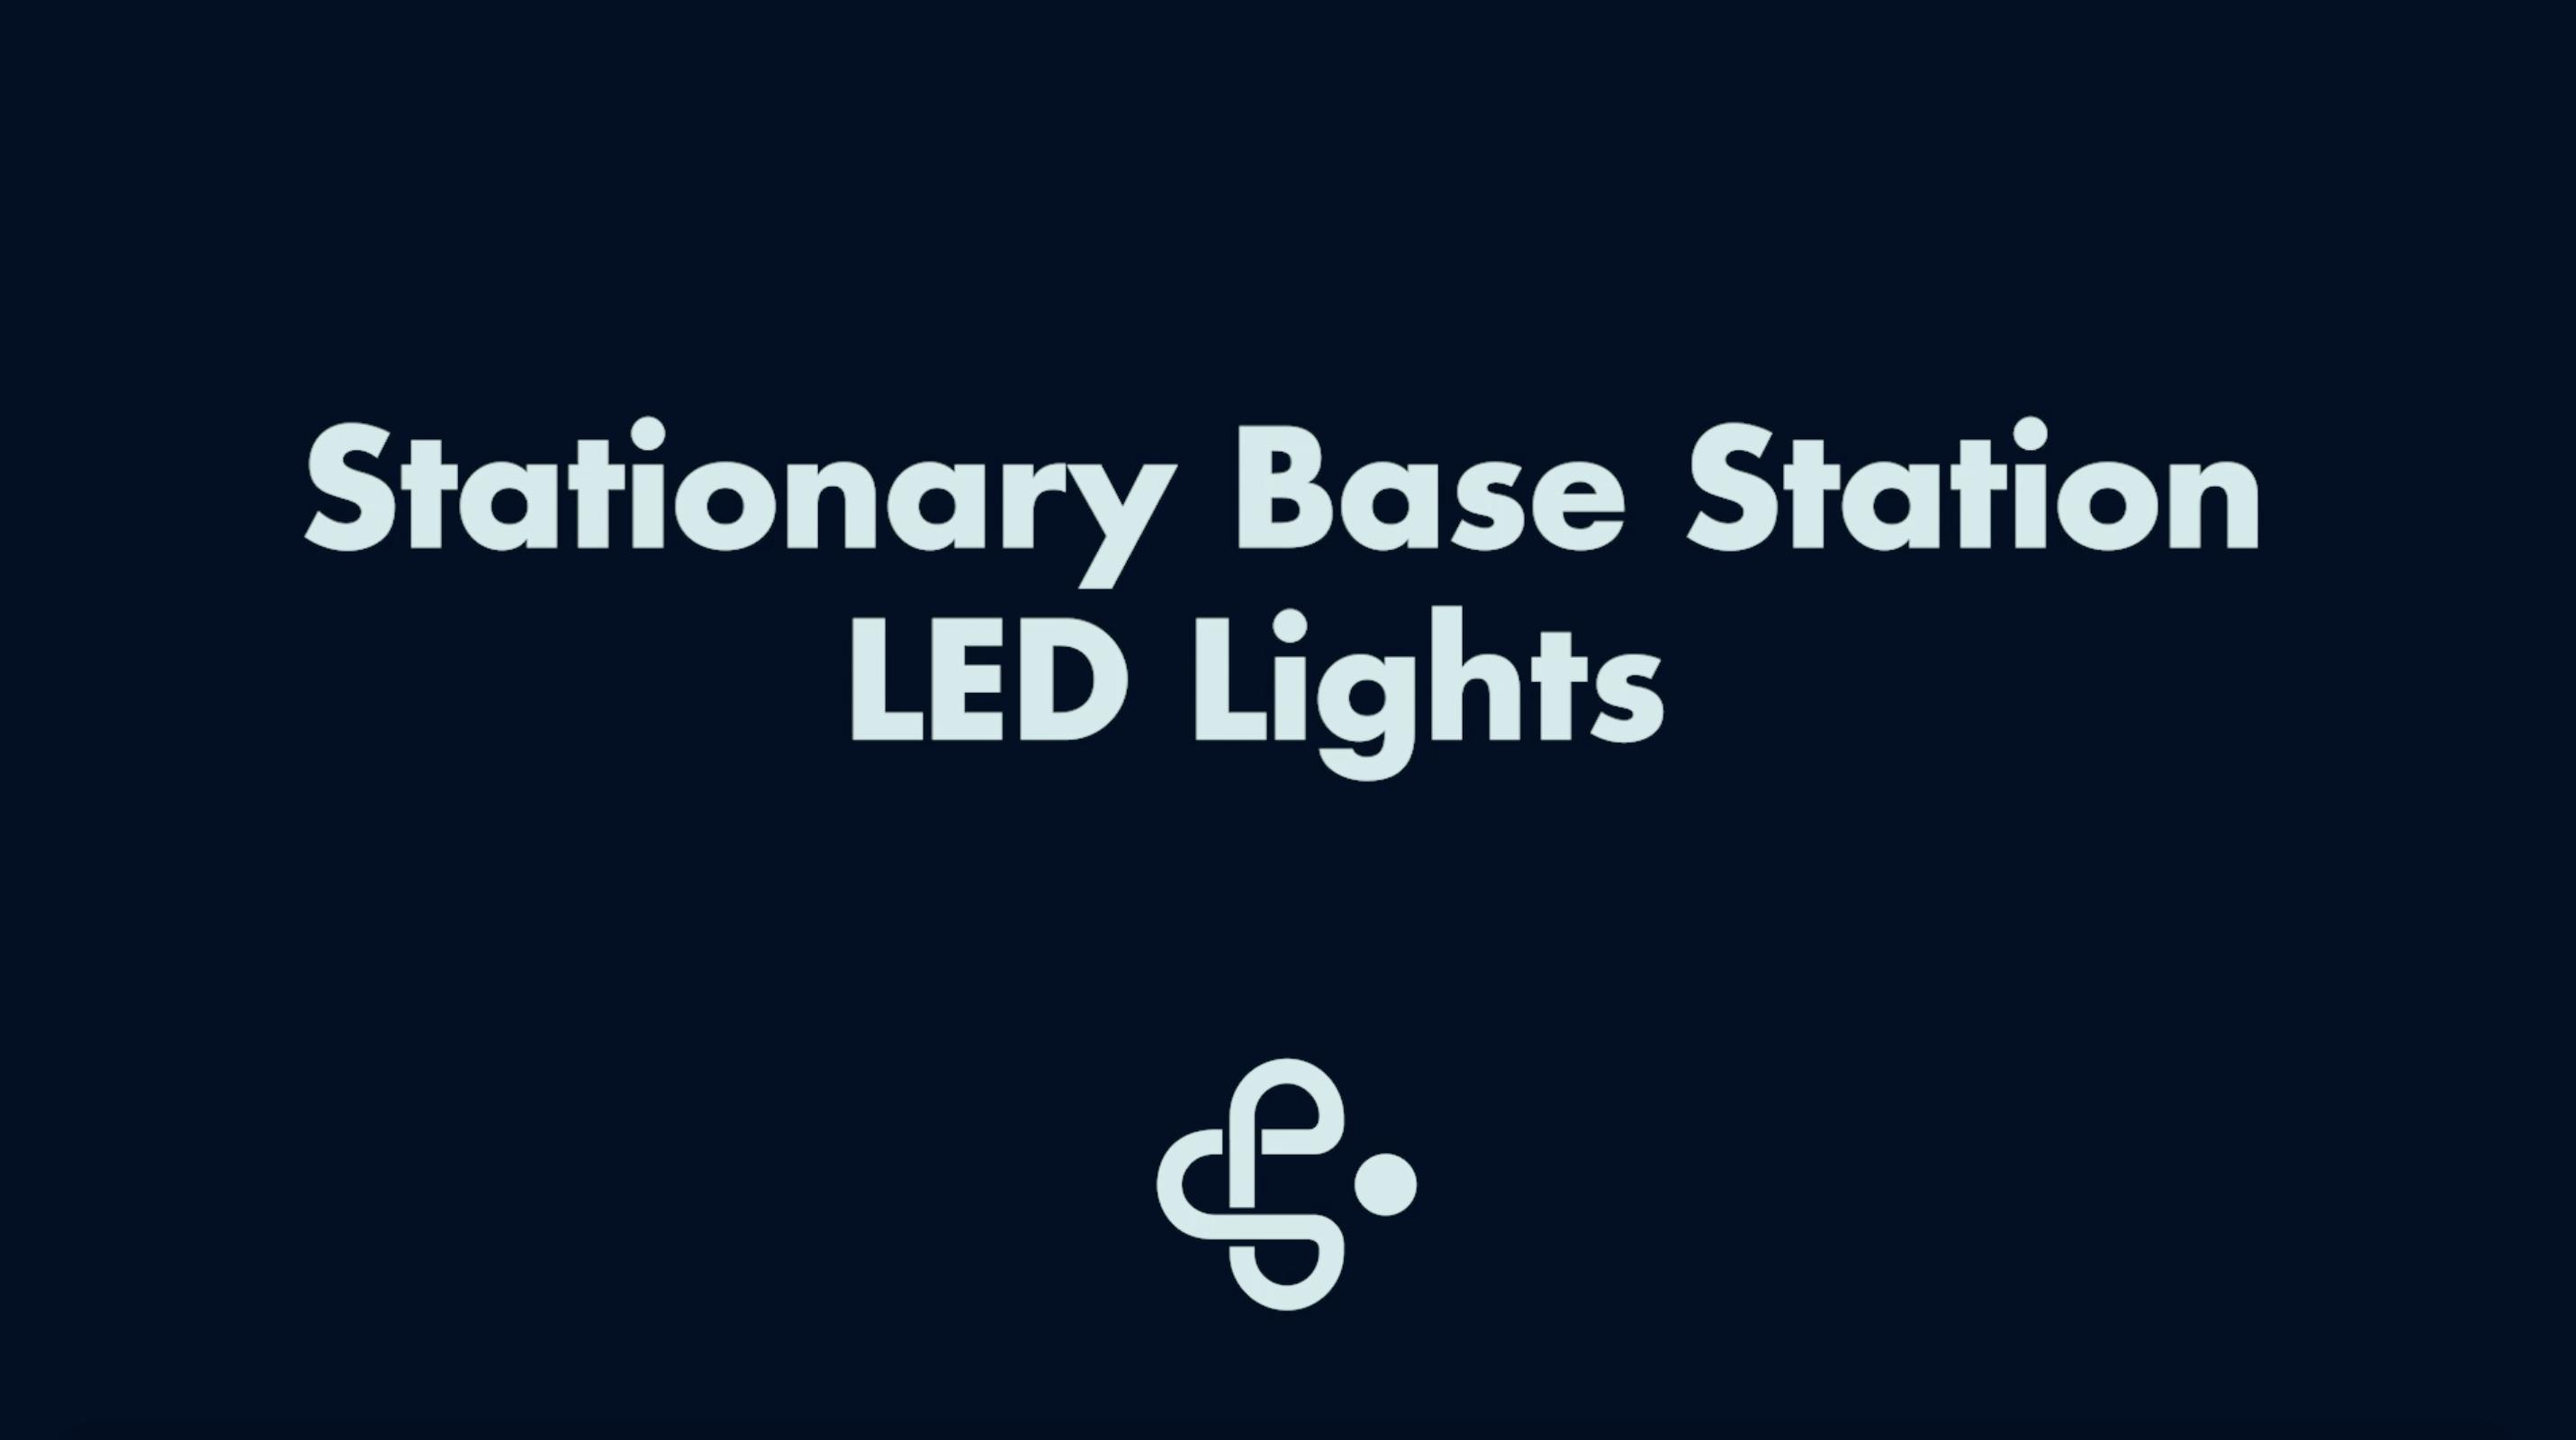 Stationary Base Station LED Lights